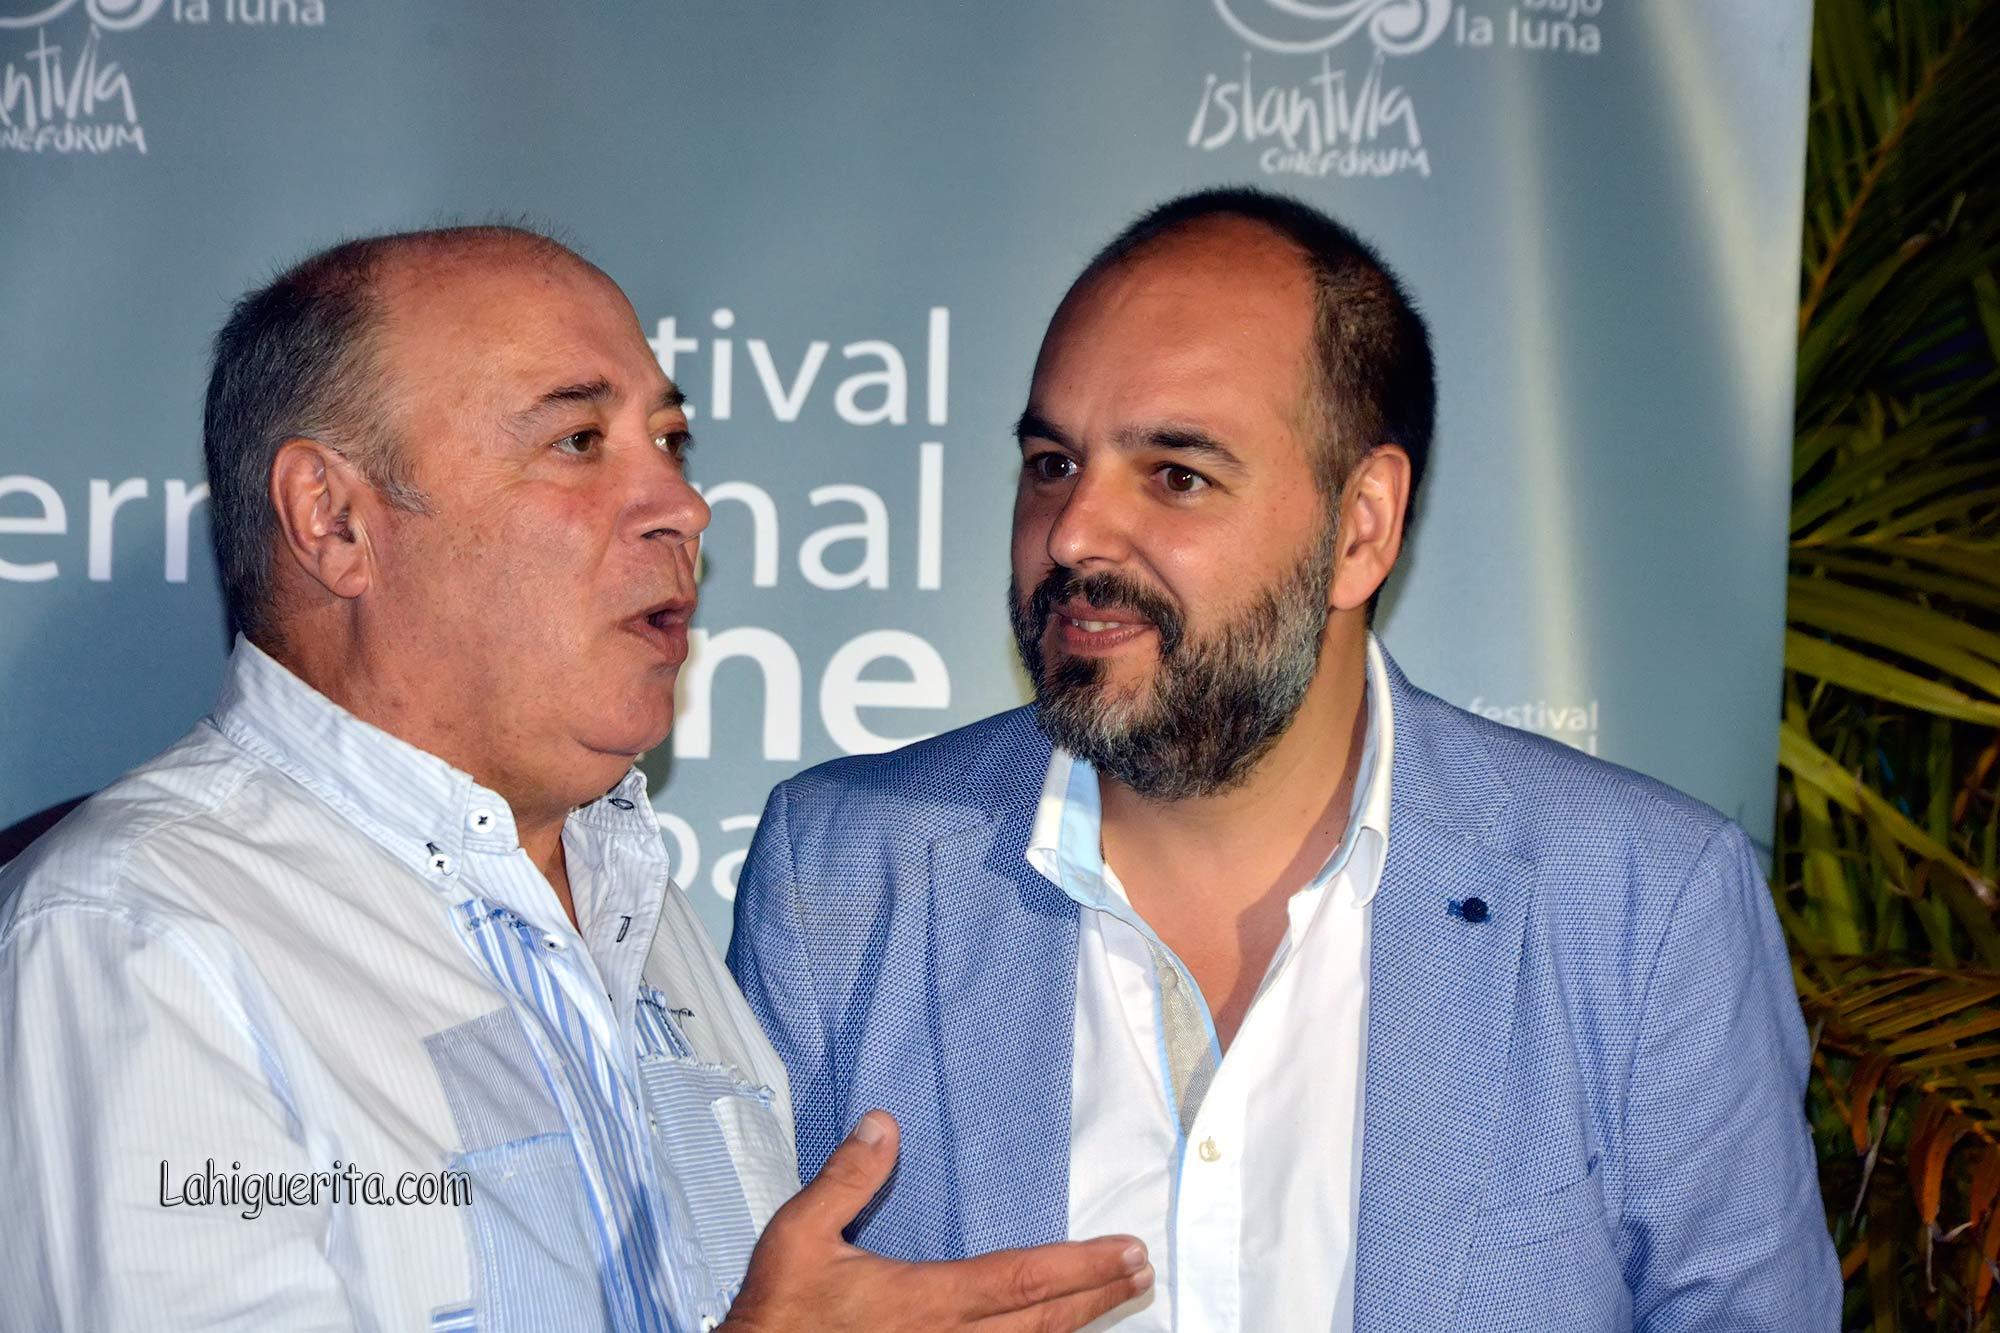 Francisco-Zamudio-Esteban-Magaz-_DSC8314